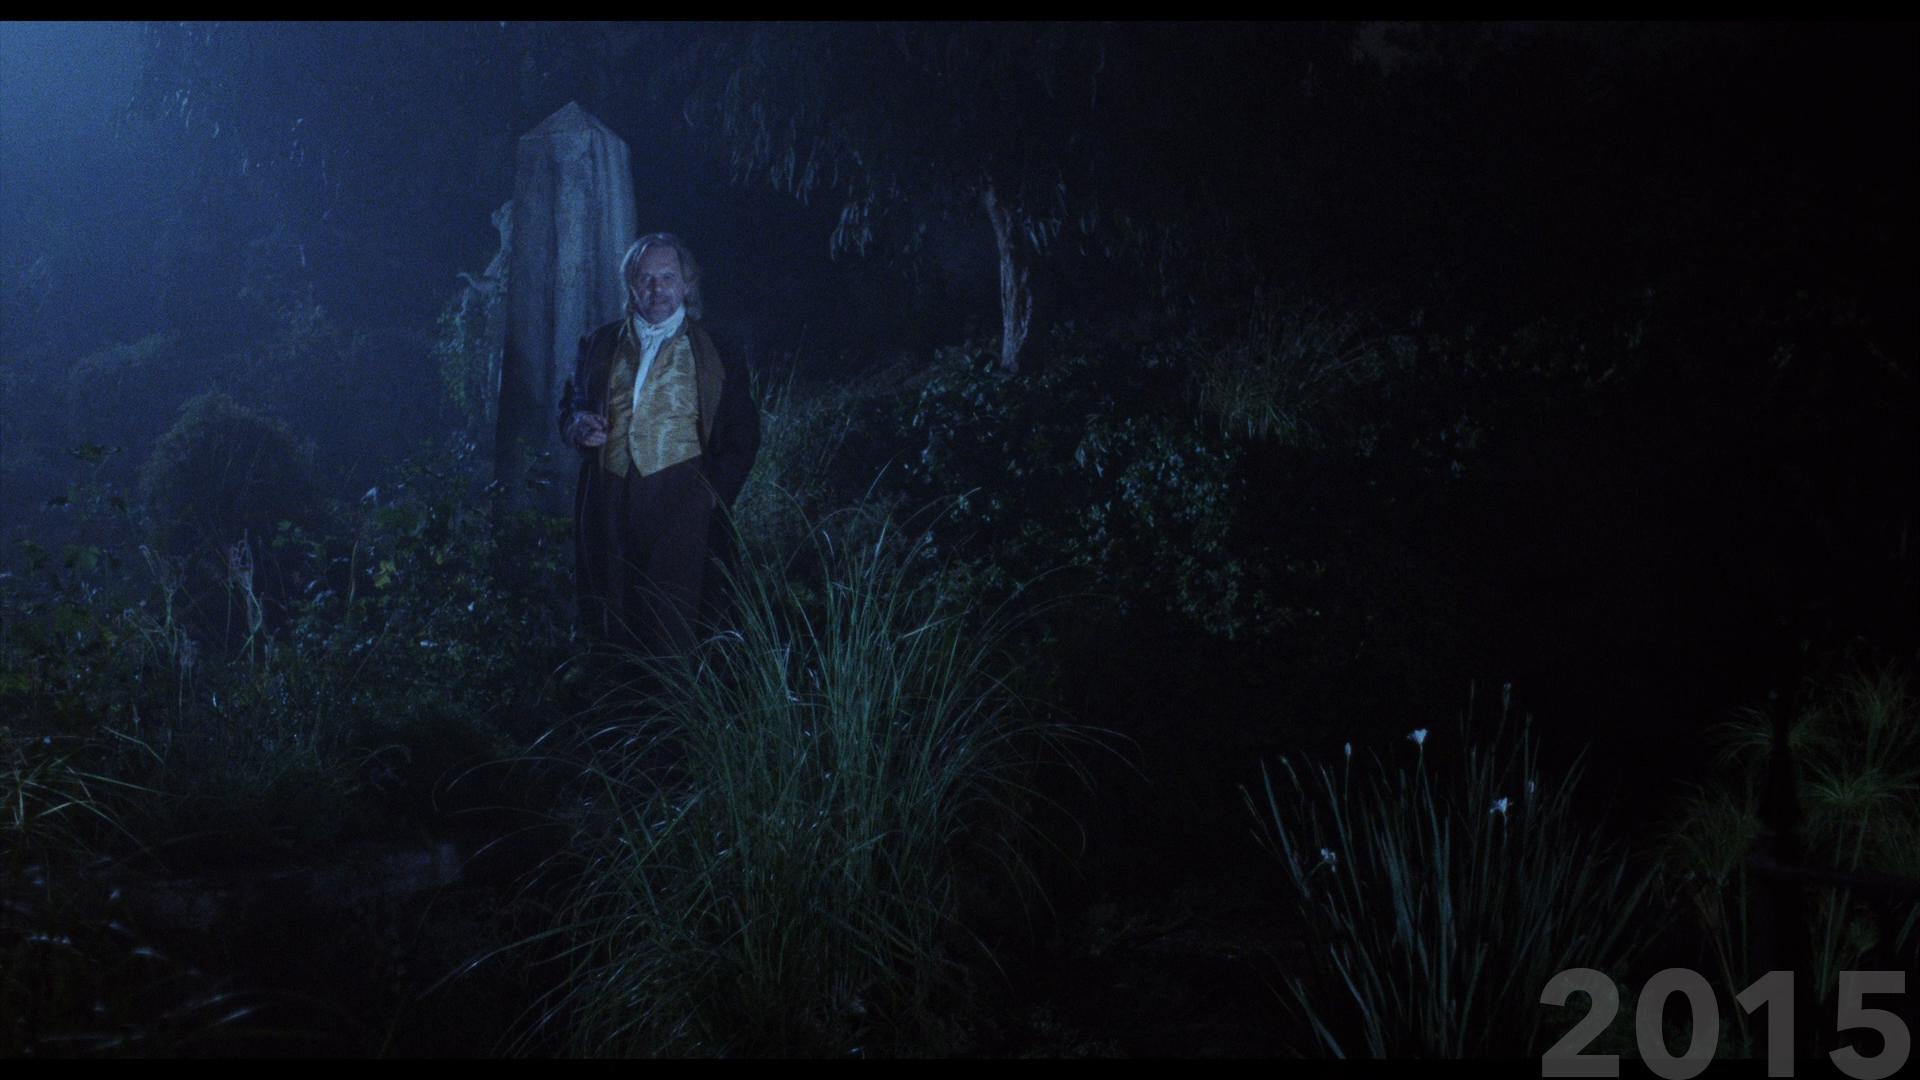 Bram Stoker's Dracula Dr. Van Helsing